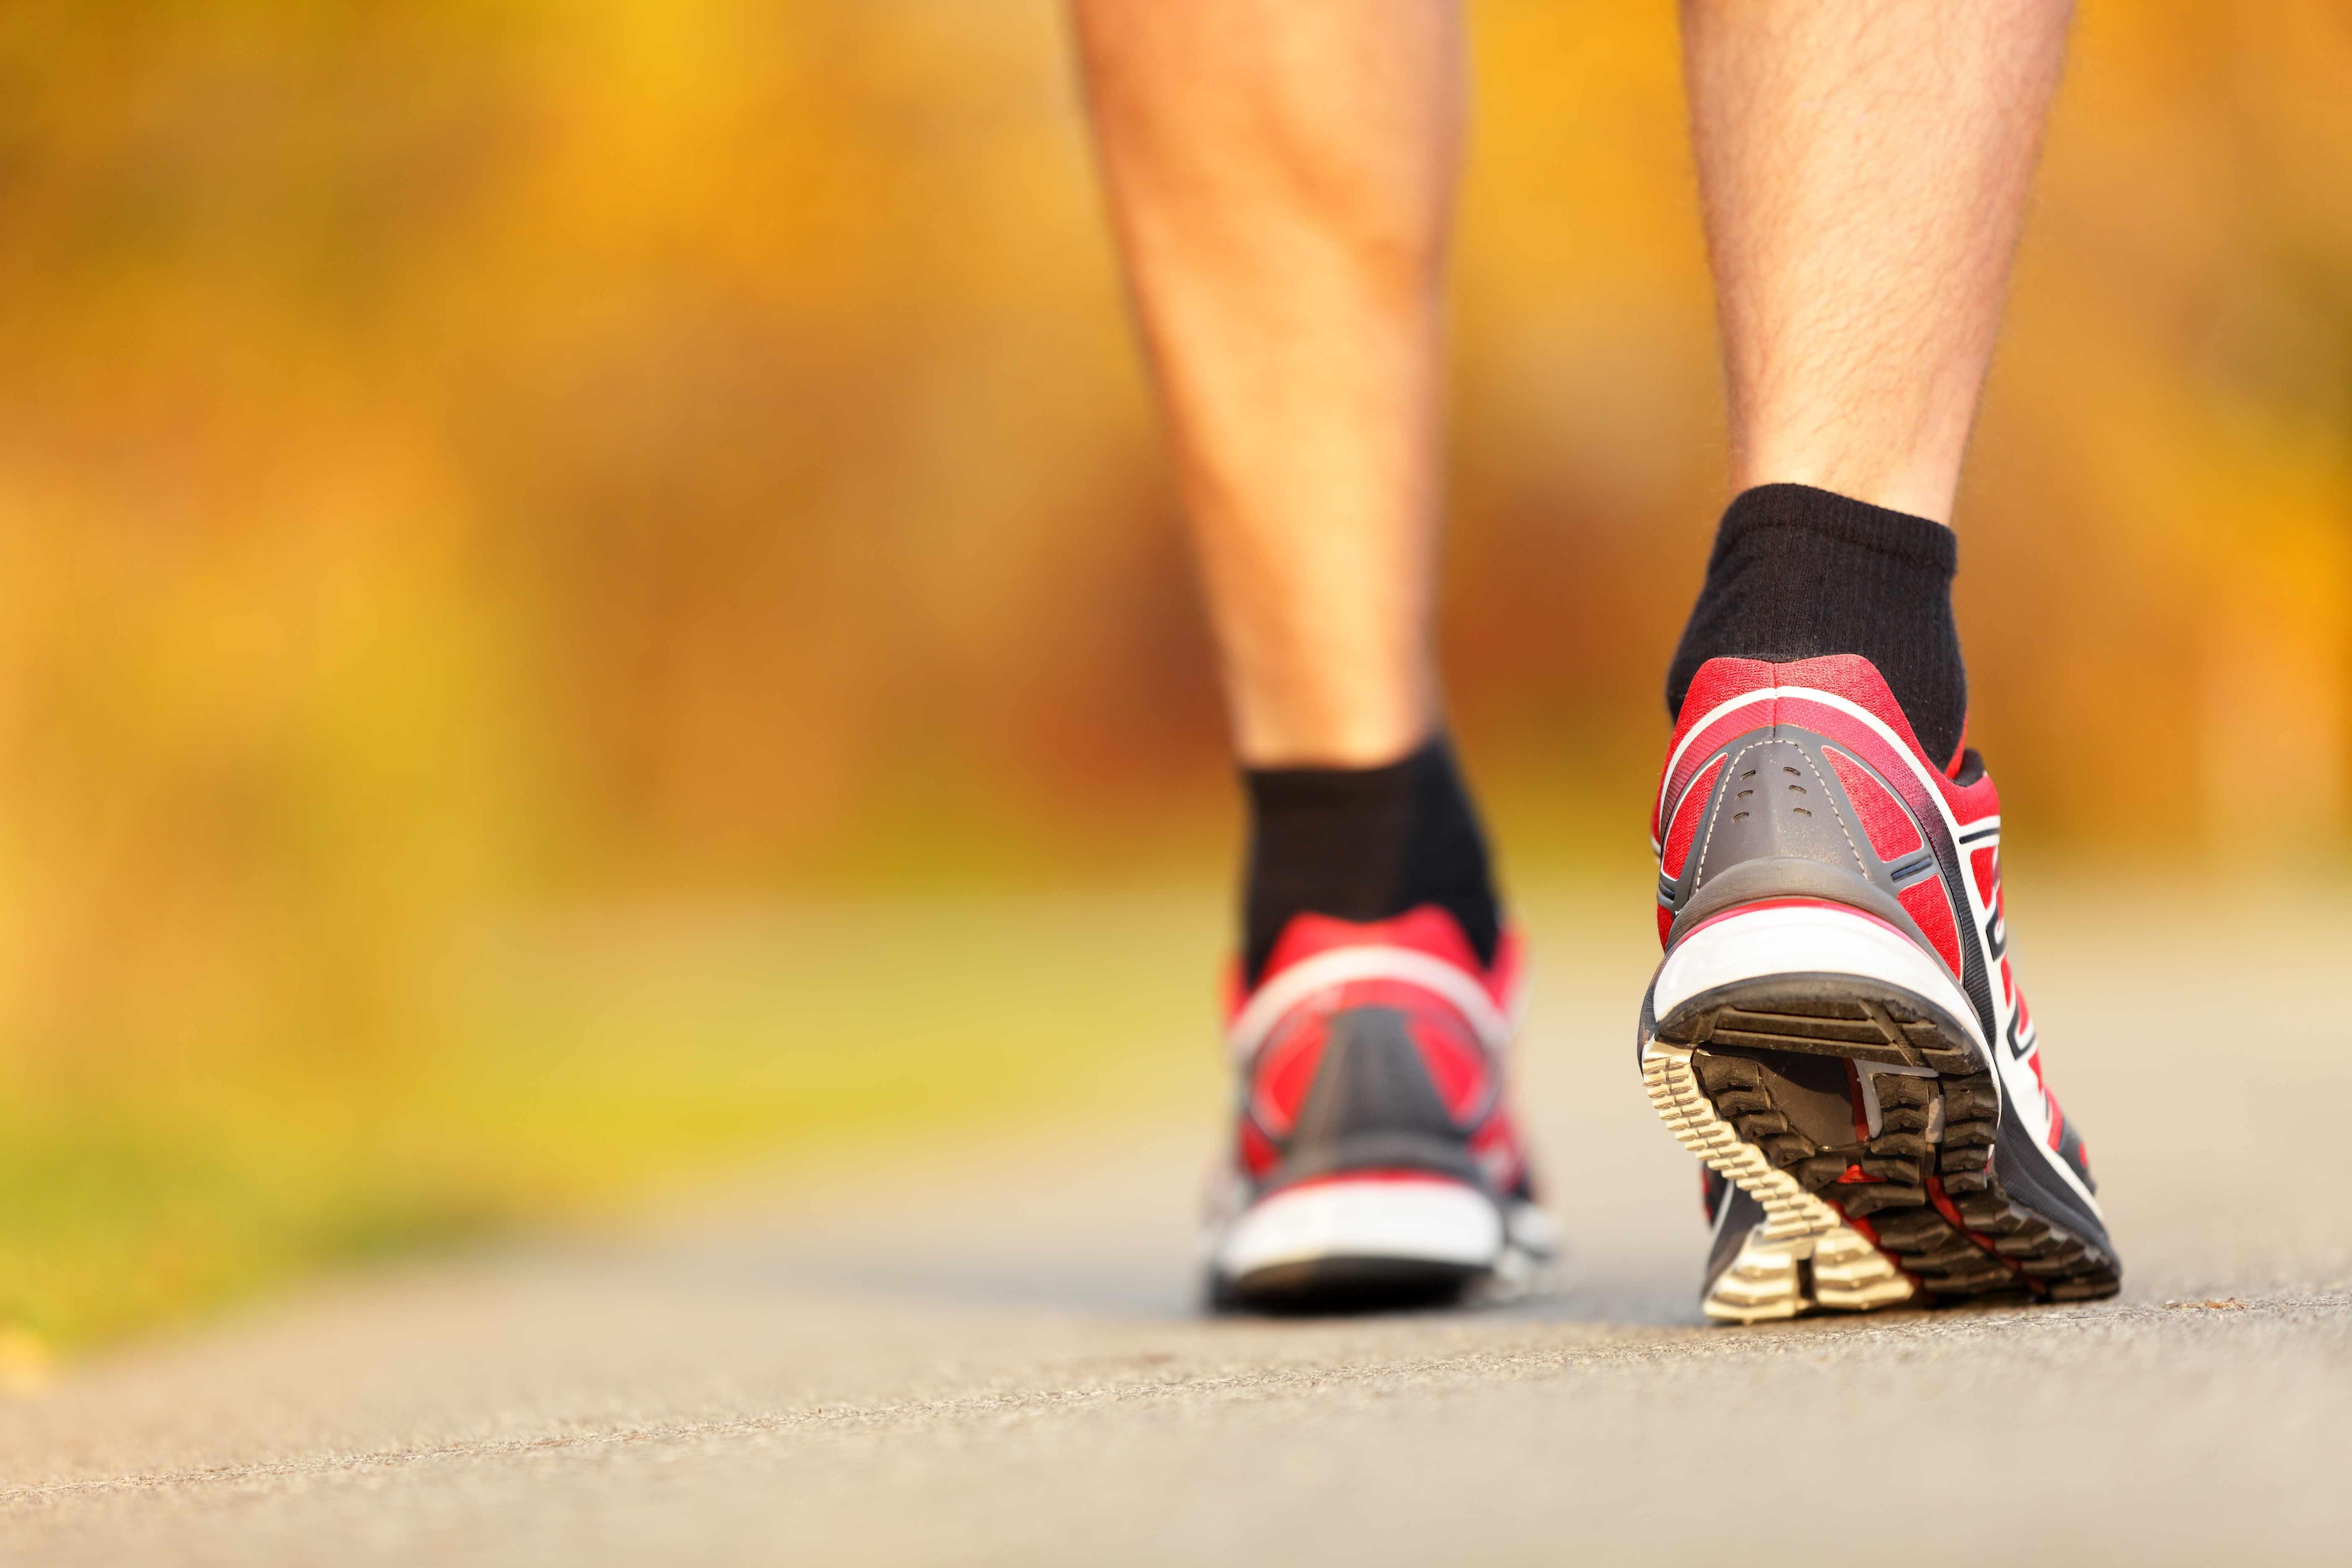 Closeup of male running or walking